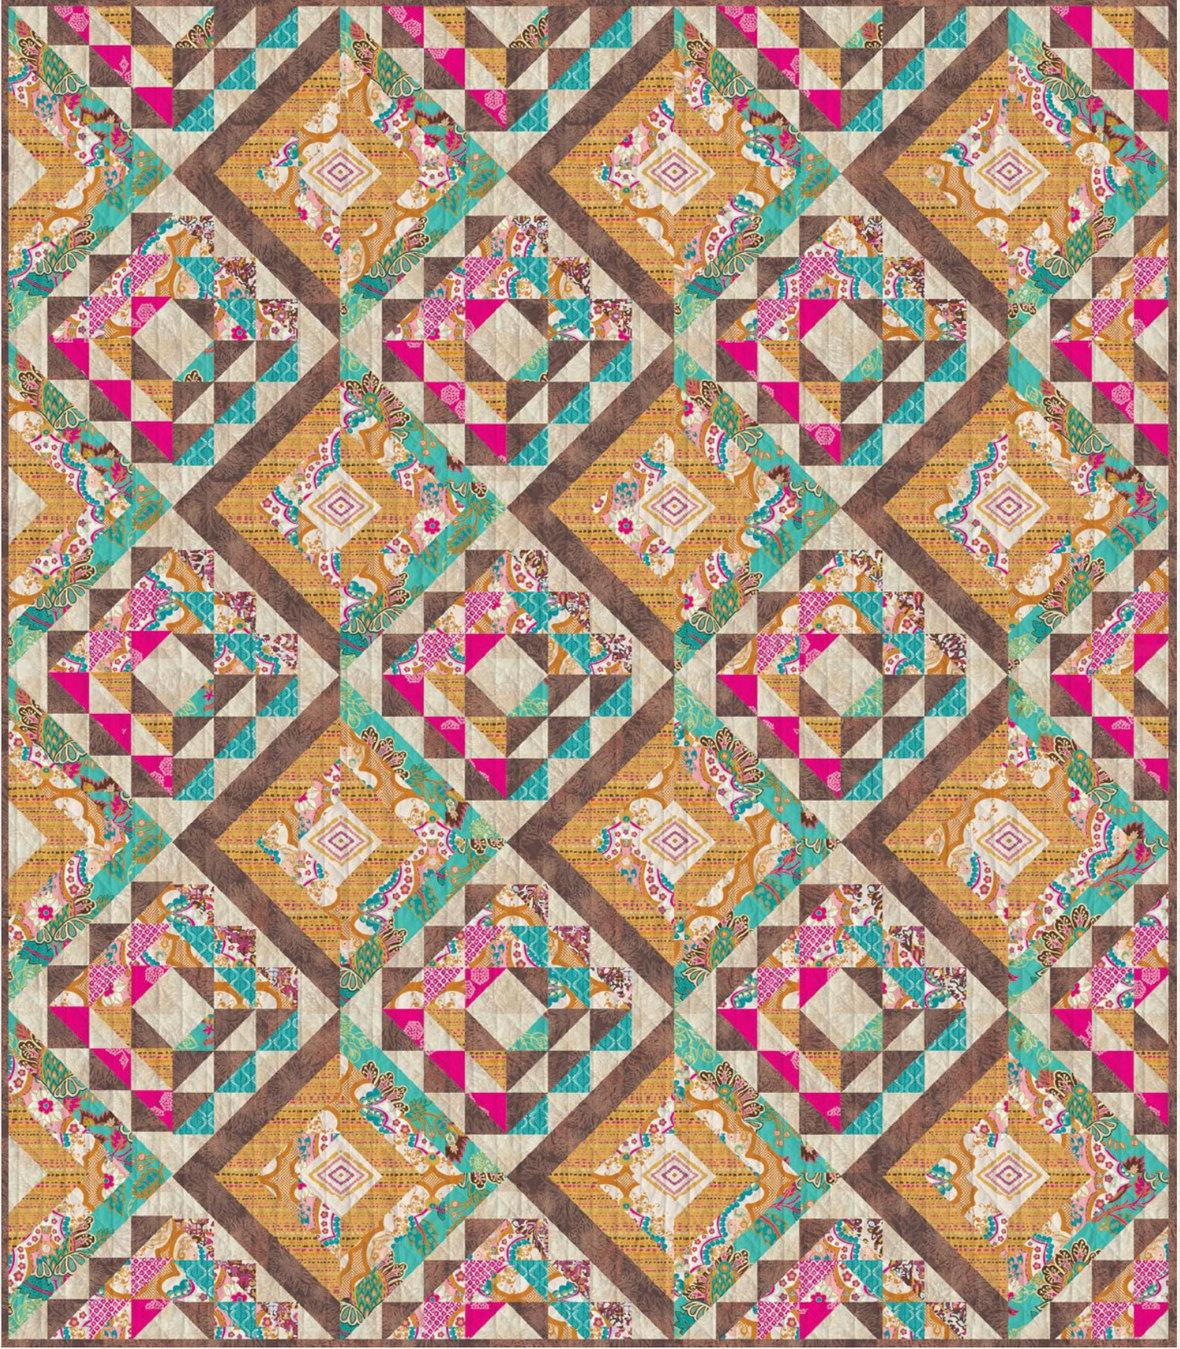 Art-Gallery-Marrakesh-Quilt-Pattern